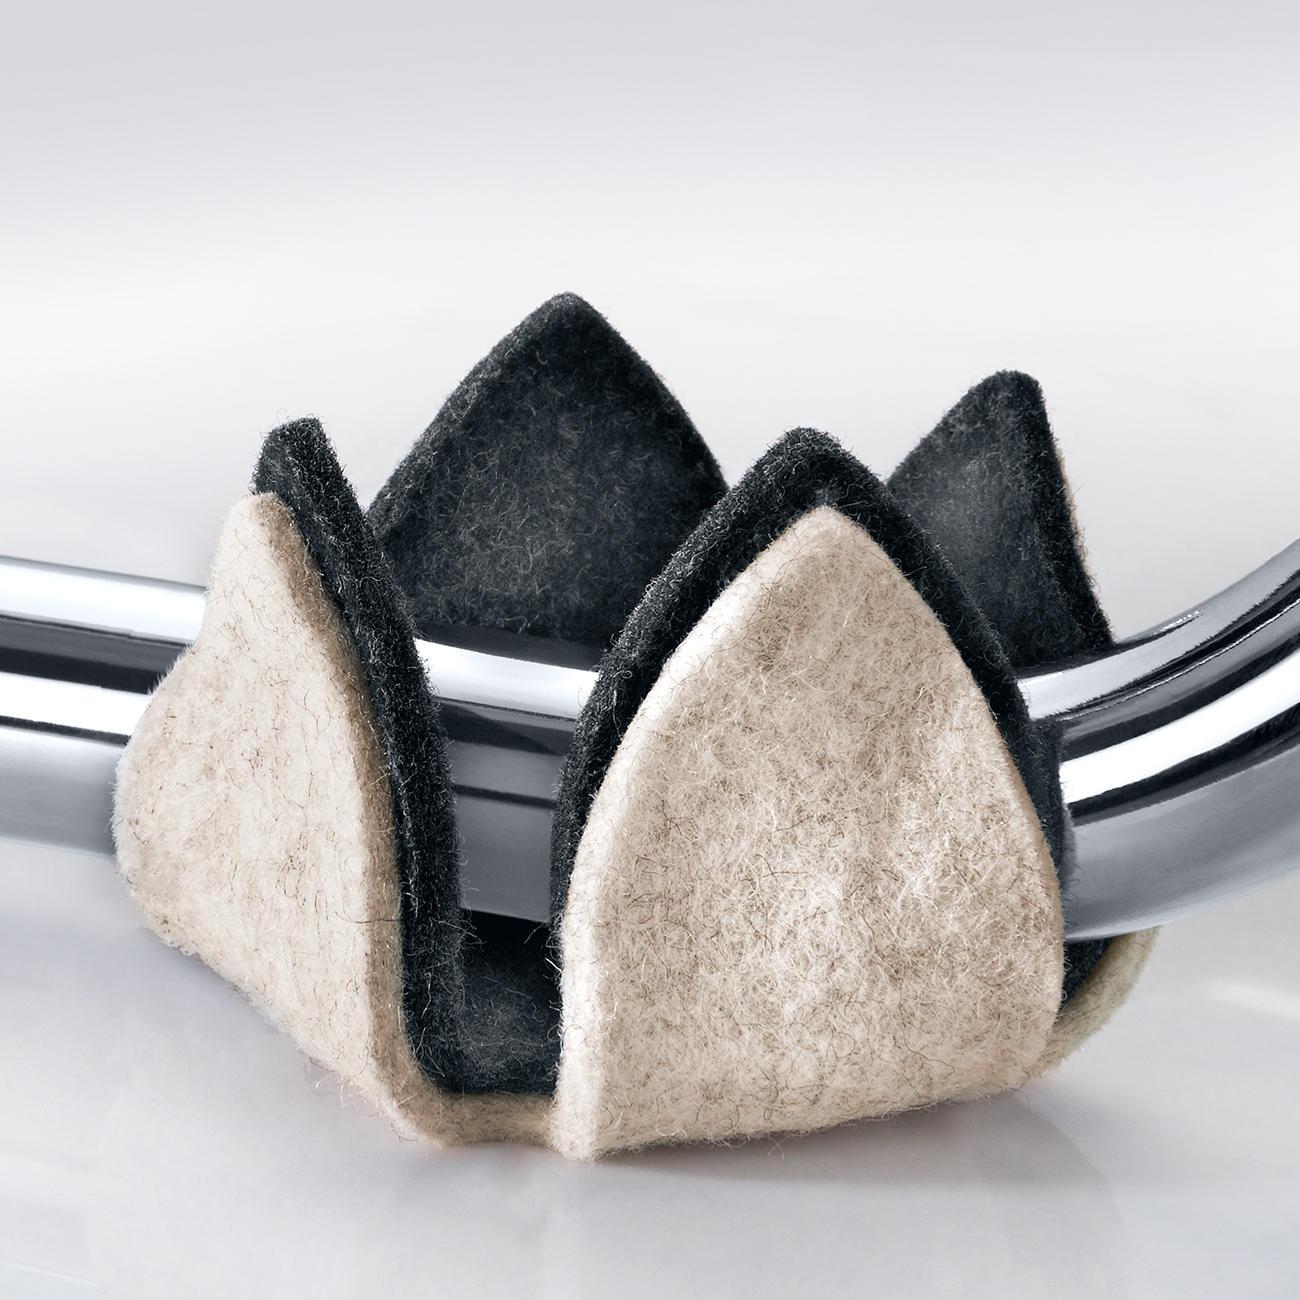 stuhlsocken wukies mini 4er set mit 3 jahren garantie. Black Bedroom Furniture Sets. Home Design Ideas